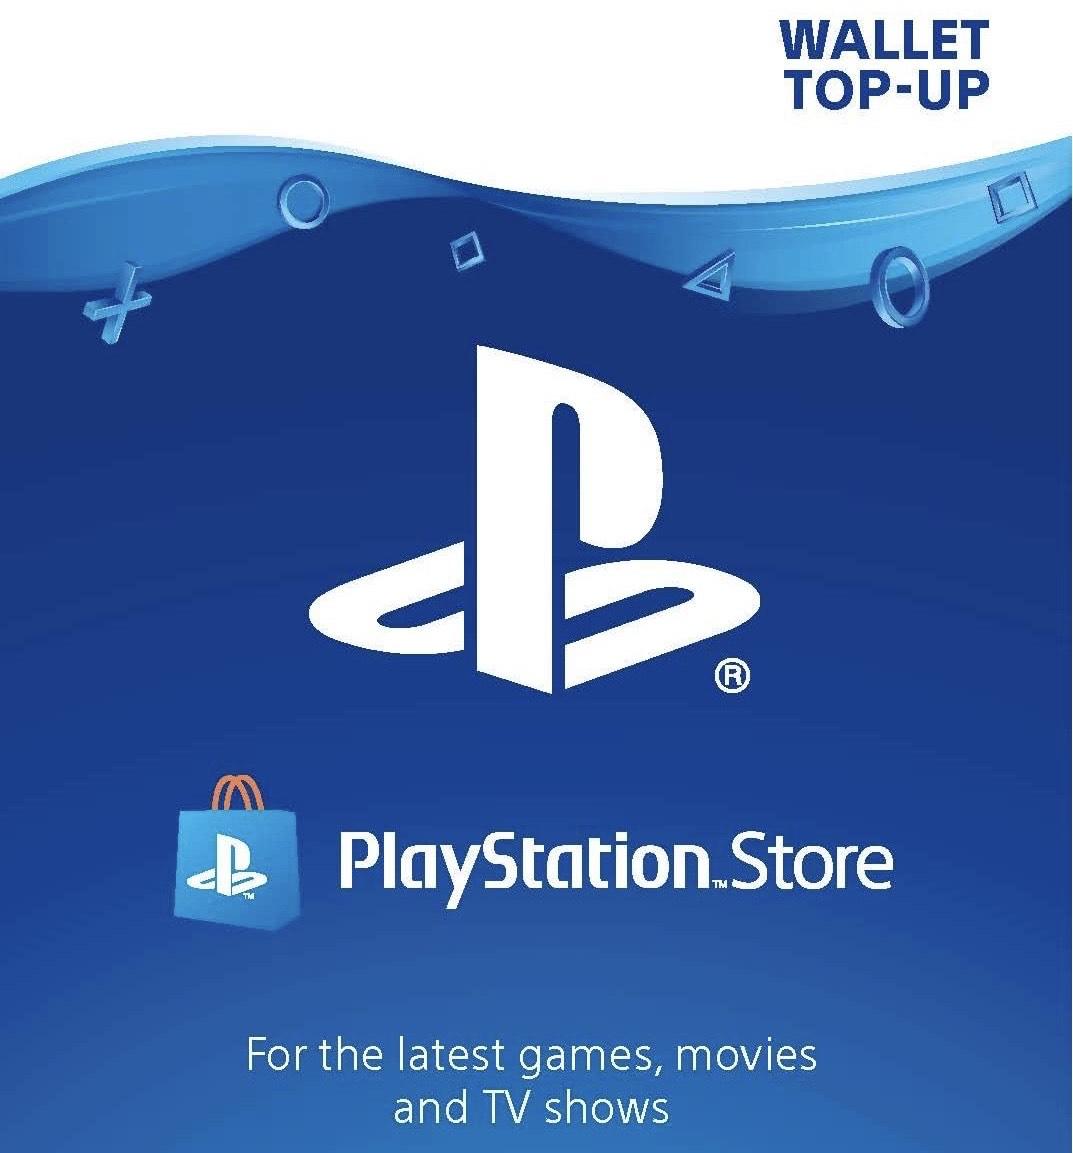 Playstation Network Wallet Top Ups: £30 = £25.85 / £35 = £29.85 / £40 = £33.85 / £45 = £37.85 / £50 = £42.85 @ ShopTo